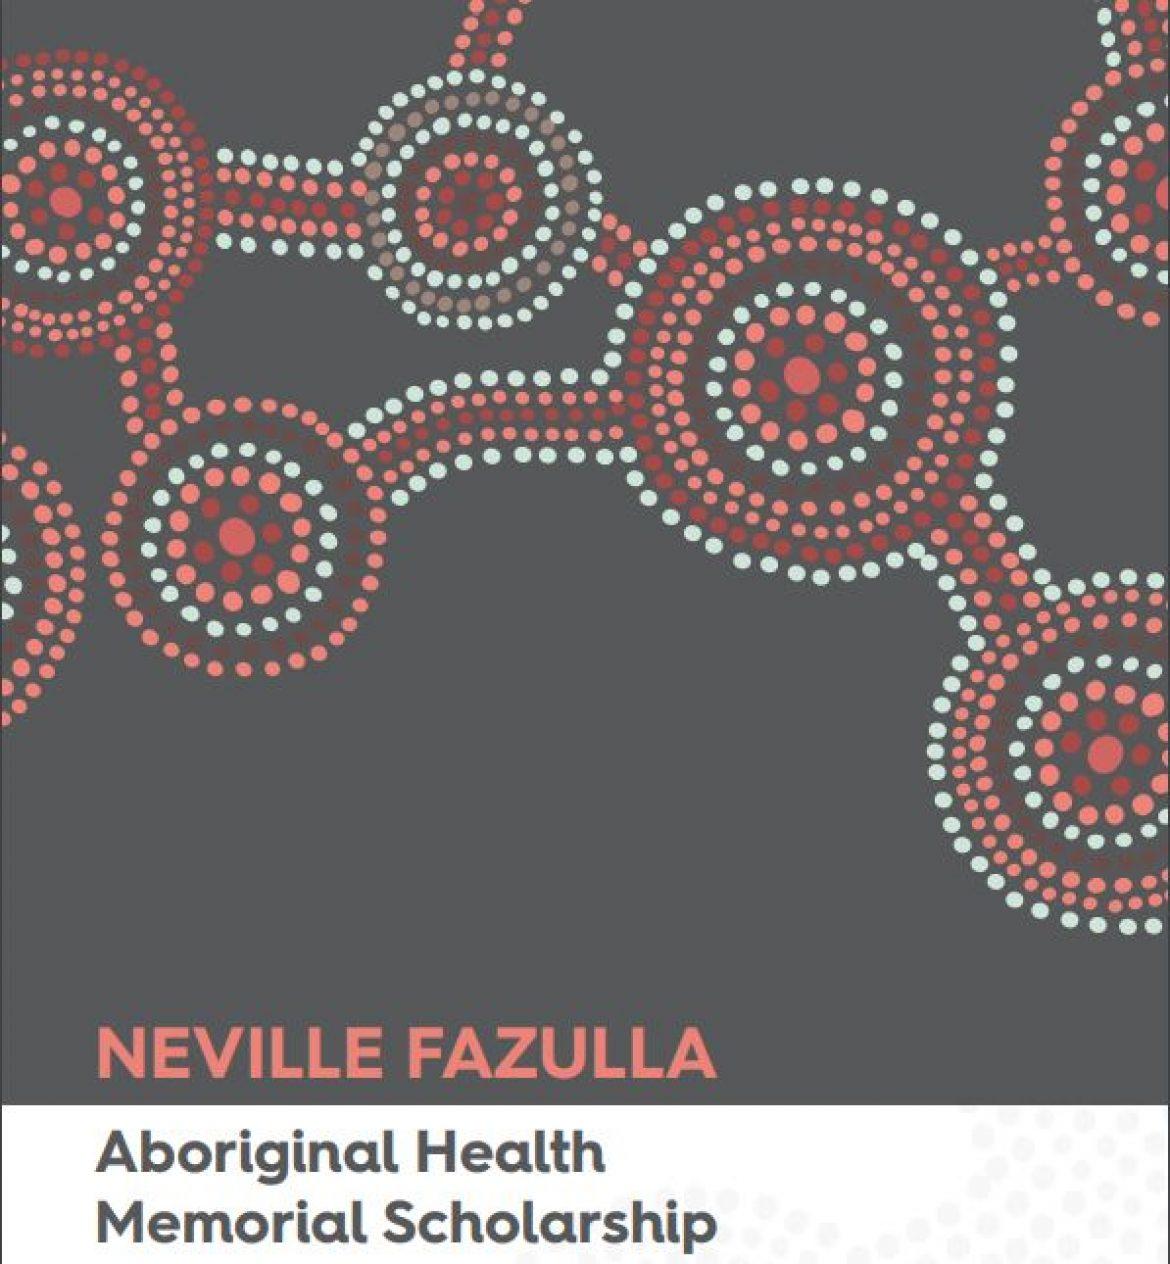 Neville Fazulla Aboriginal Health Memorial Scholarship